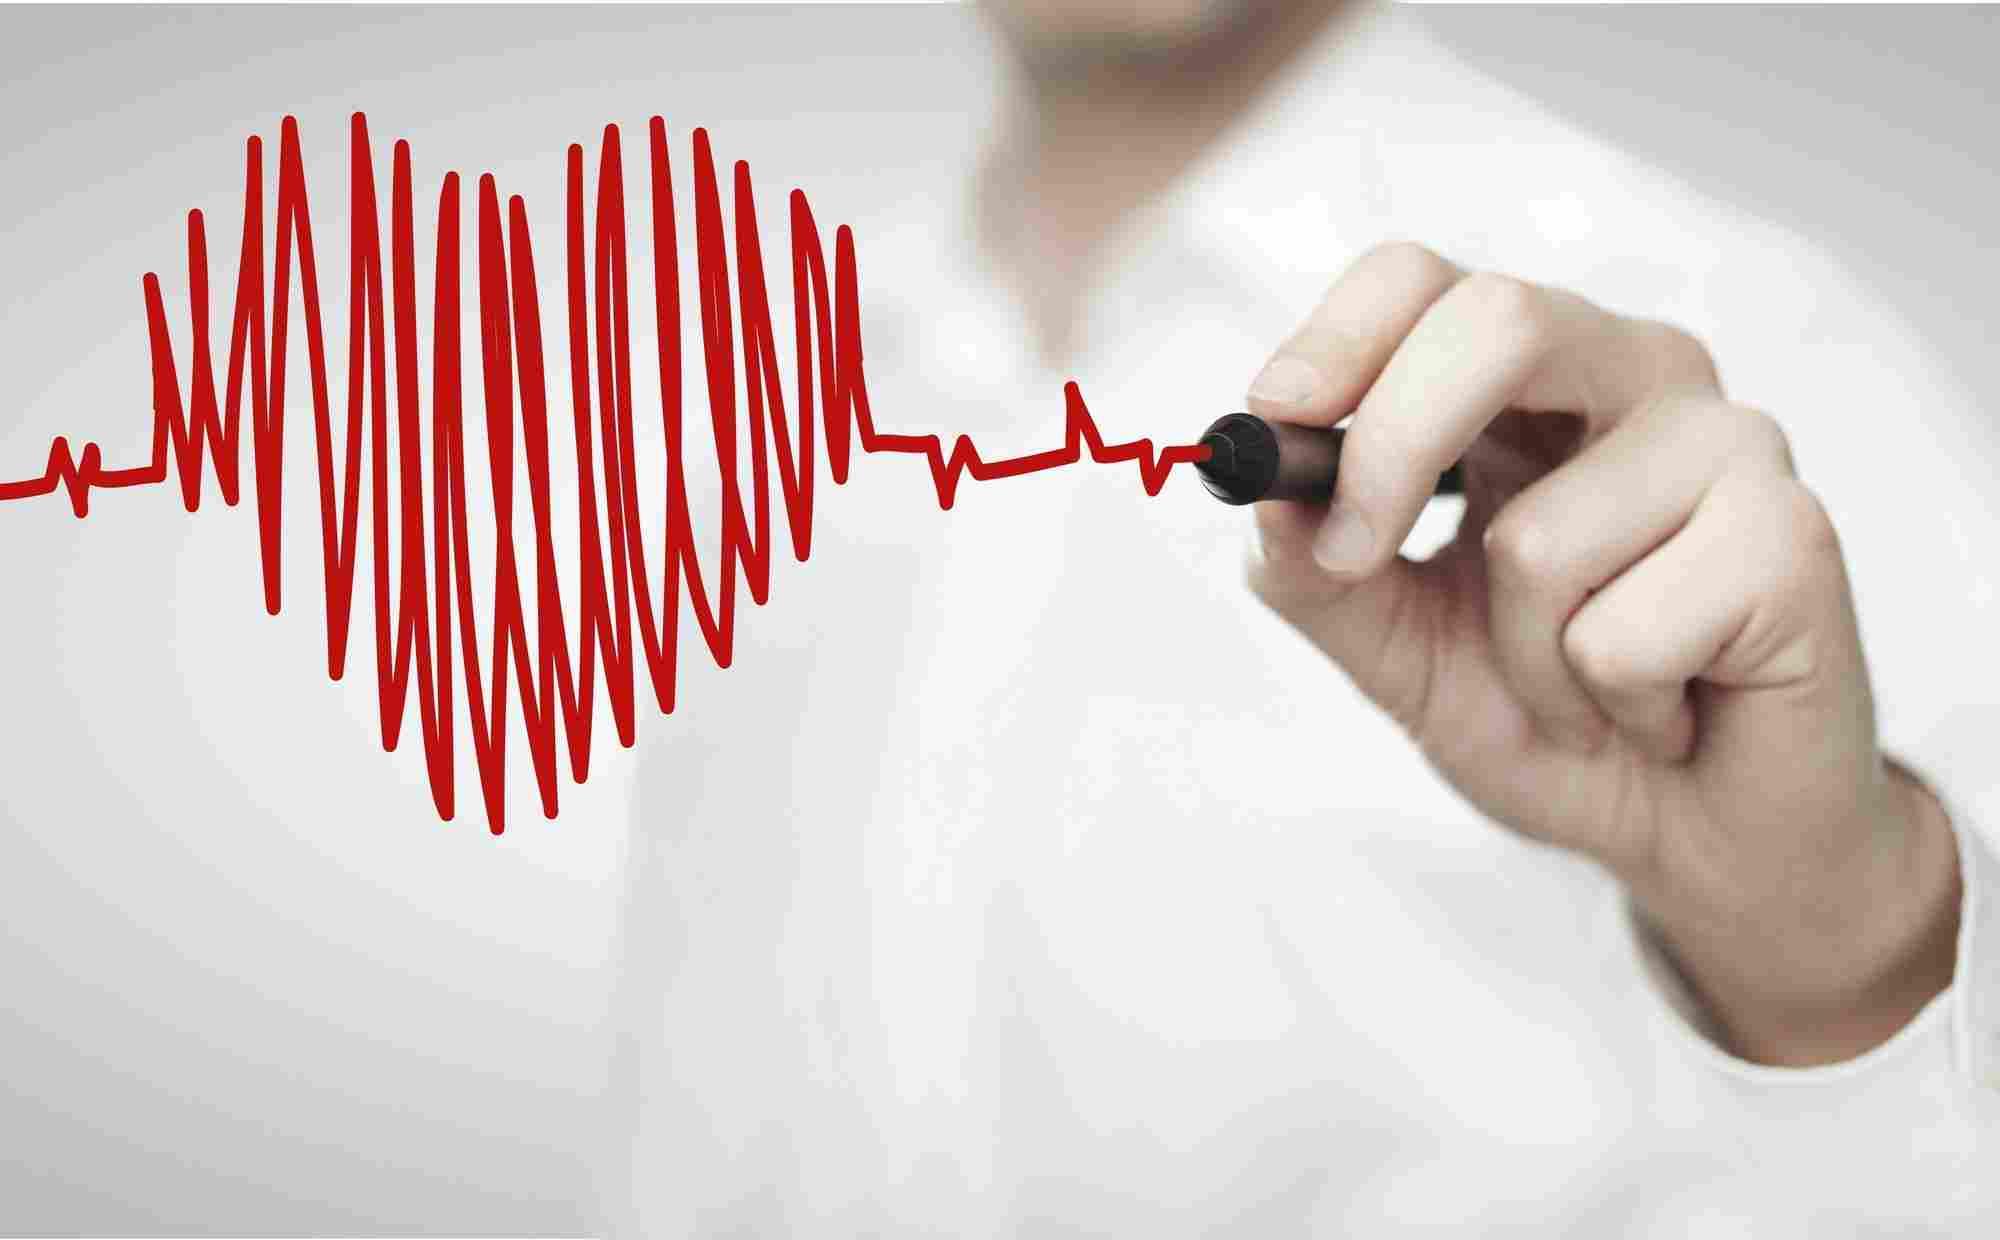 http://www.paragonanalysis.com/wp-content/uploads/2015/12/heart-health-1.jpg